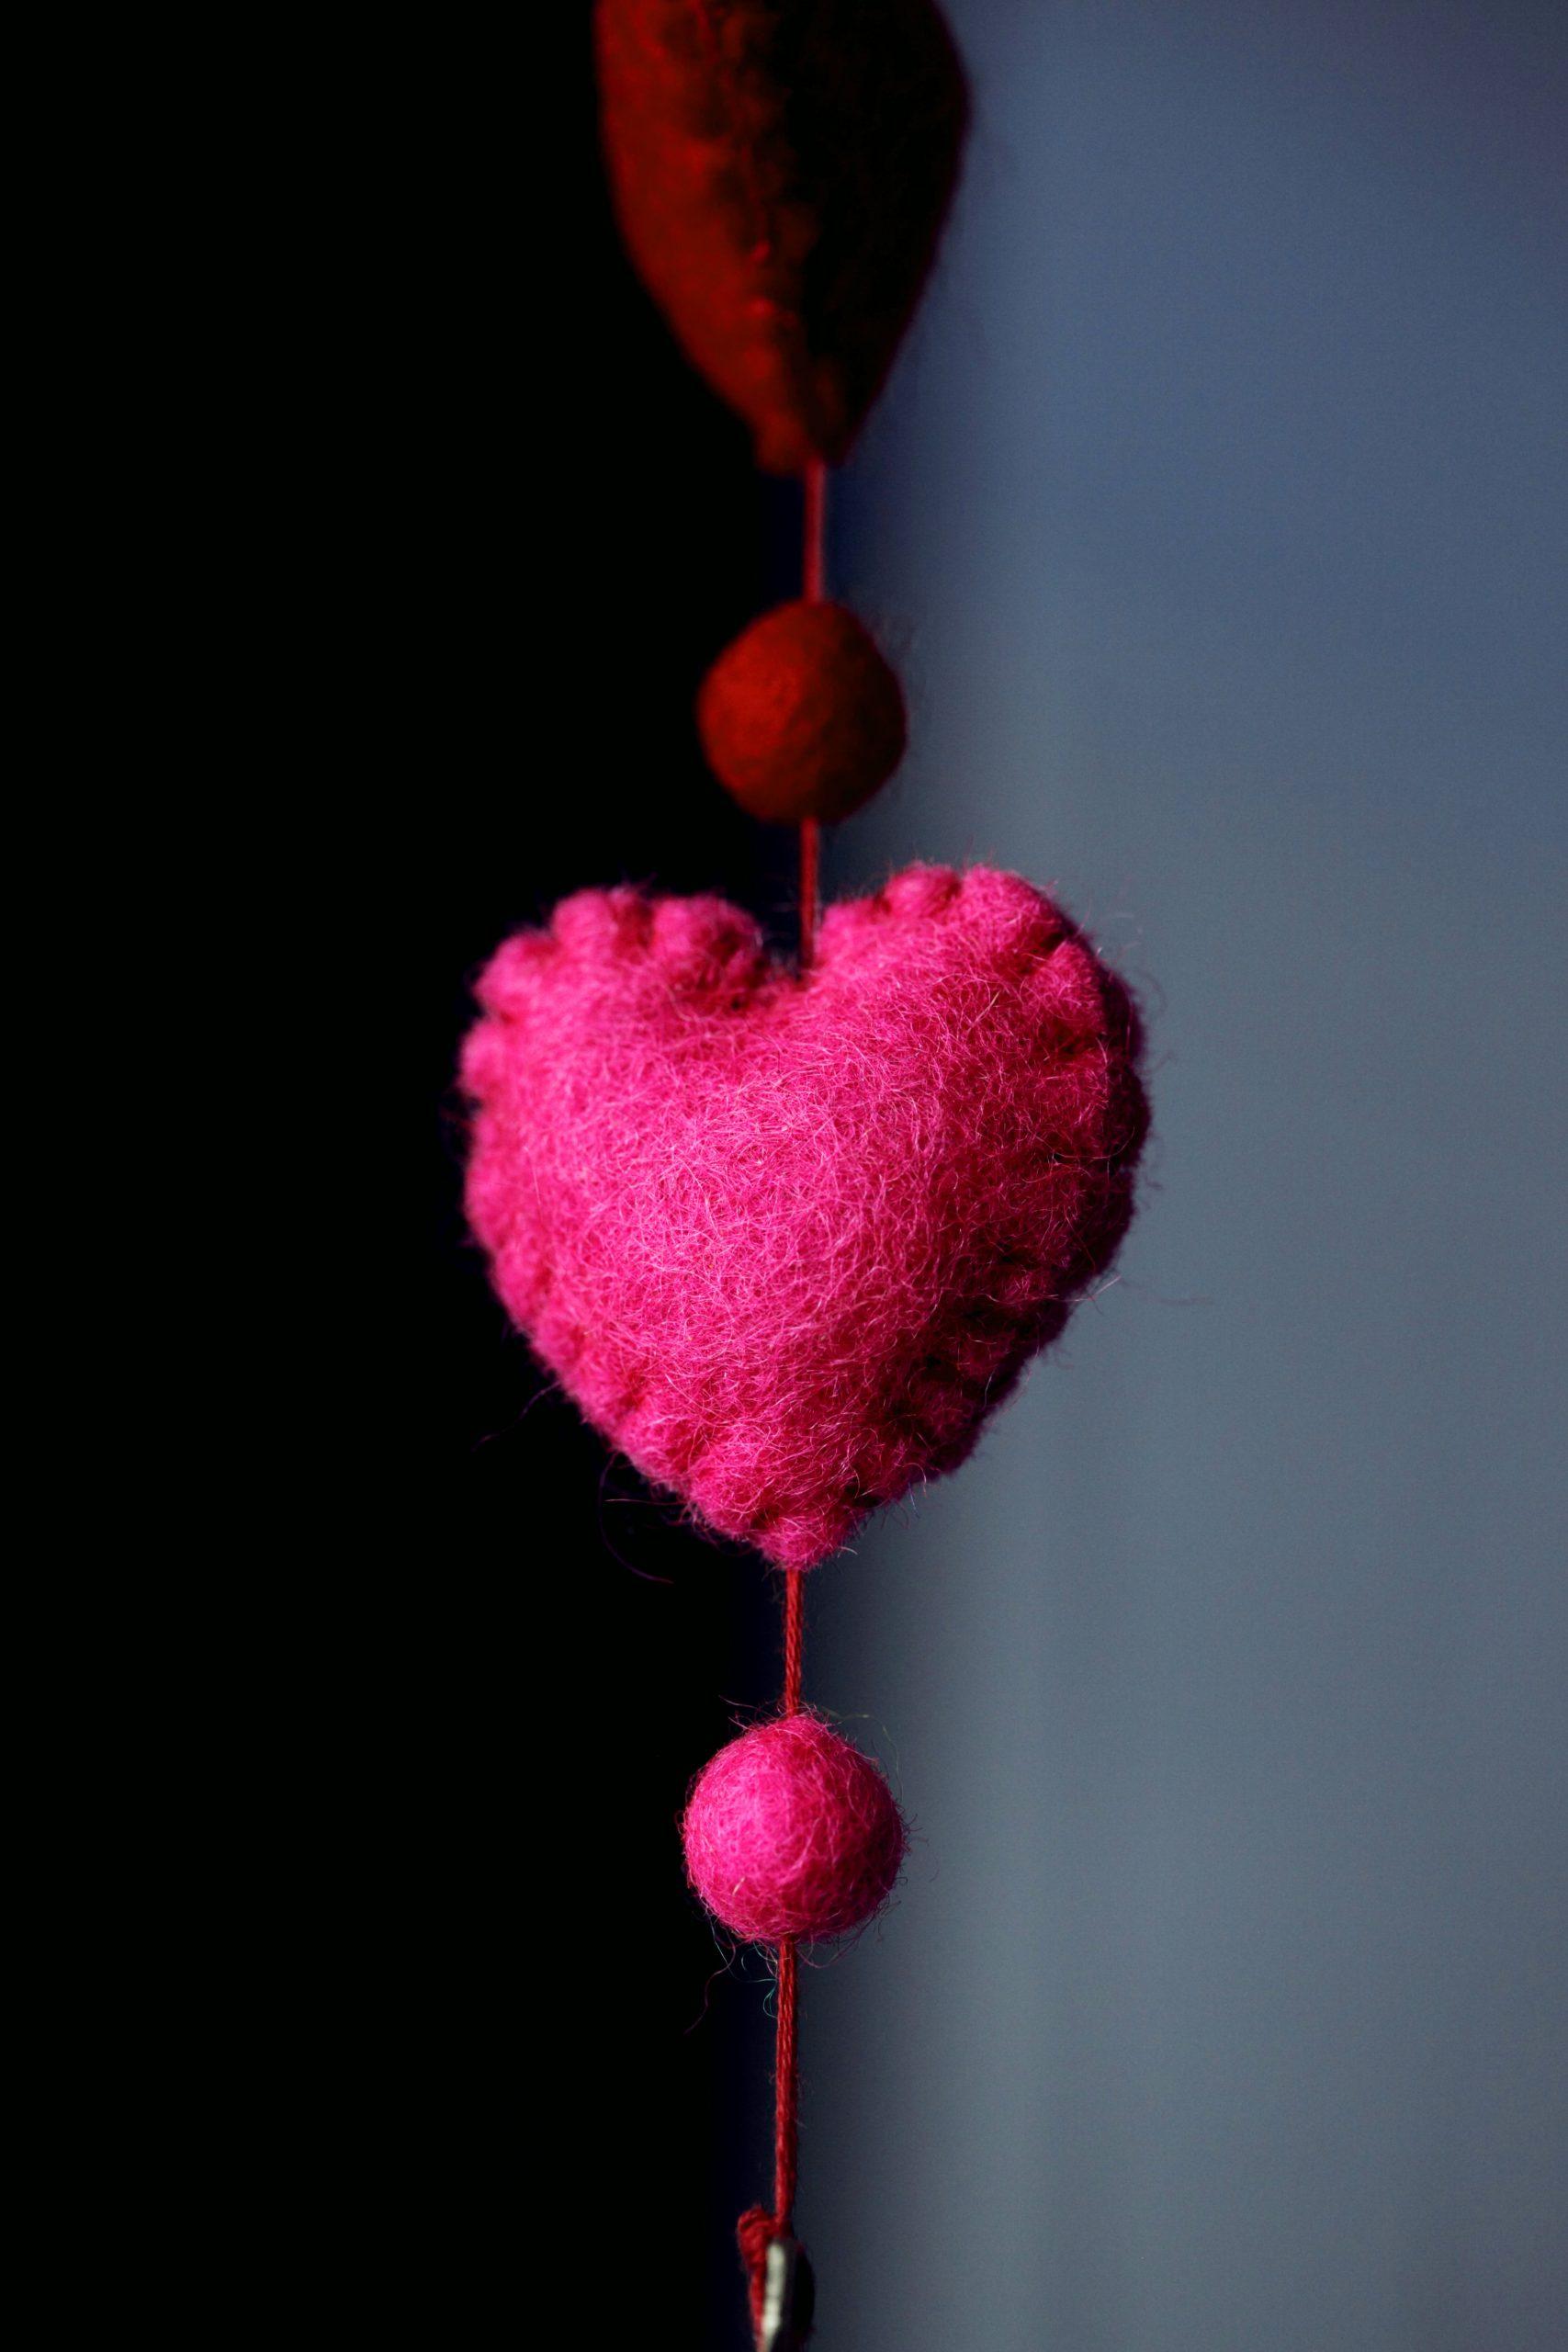 New Love Couple Sad Whatsapp Dp Images pics download